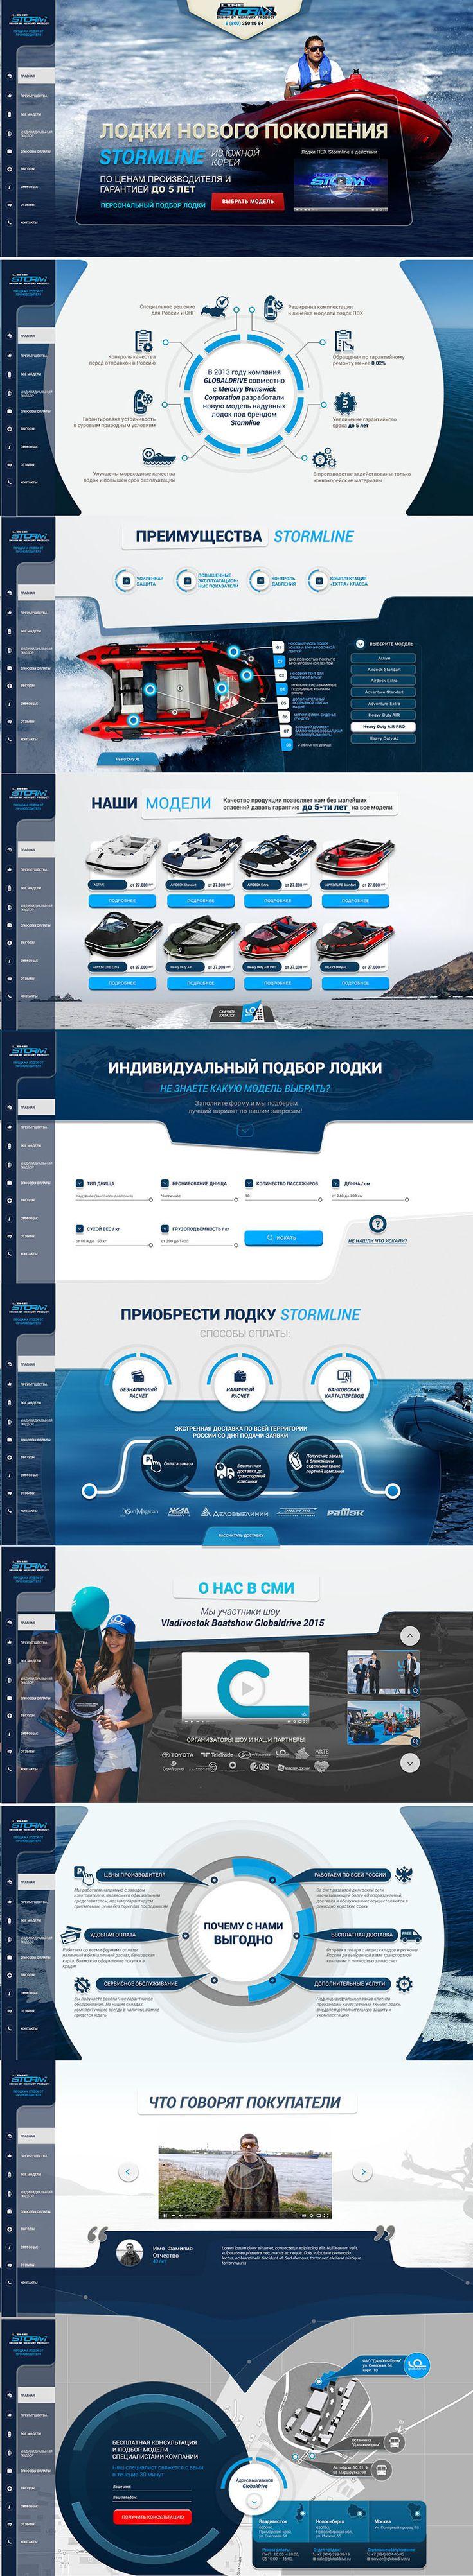 Landing Page STORM Line [Global Drive]  #landing, #page, #design, #web, #HTML5, #photoshop, #website, #boats, #speedboat, #extreme